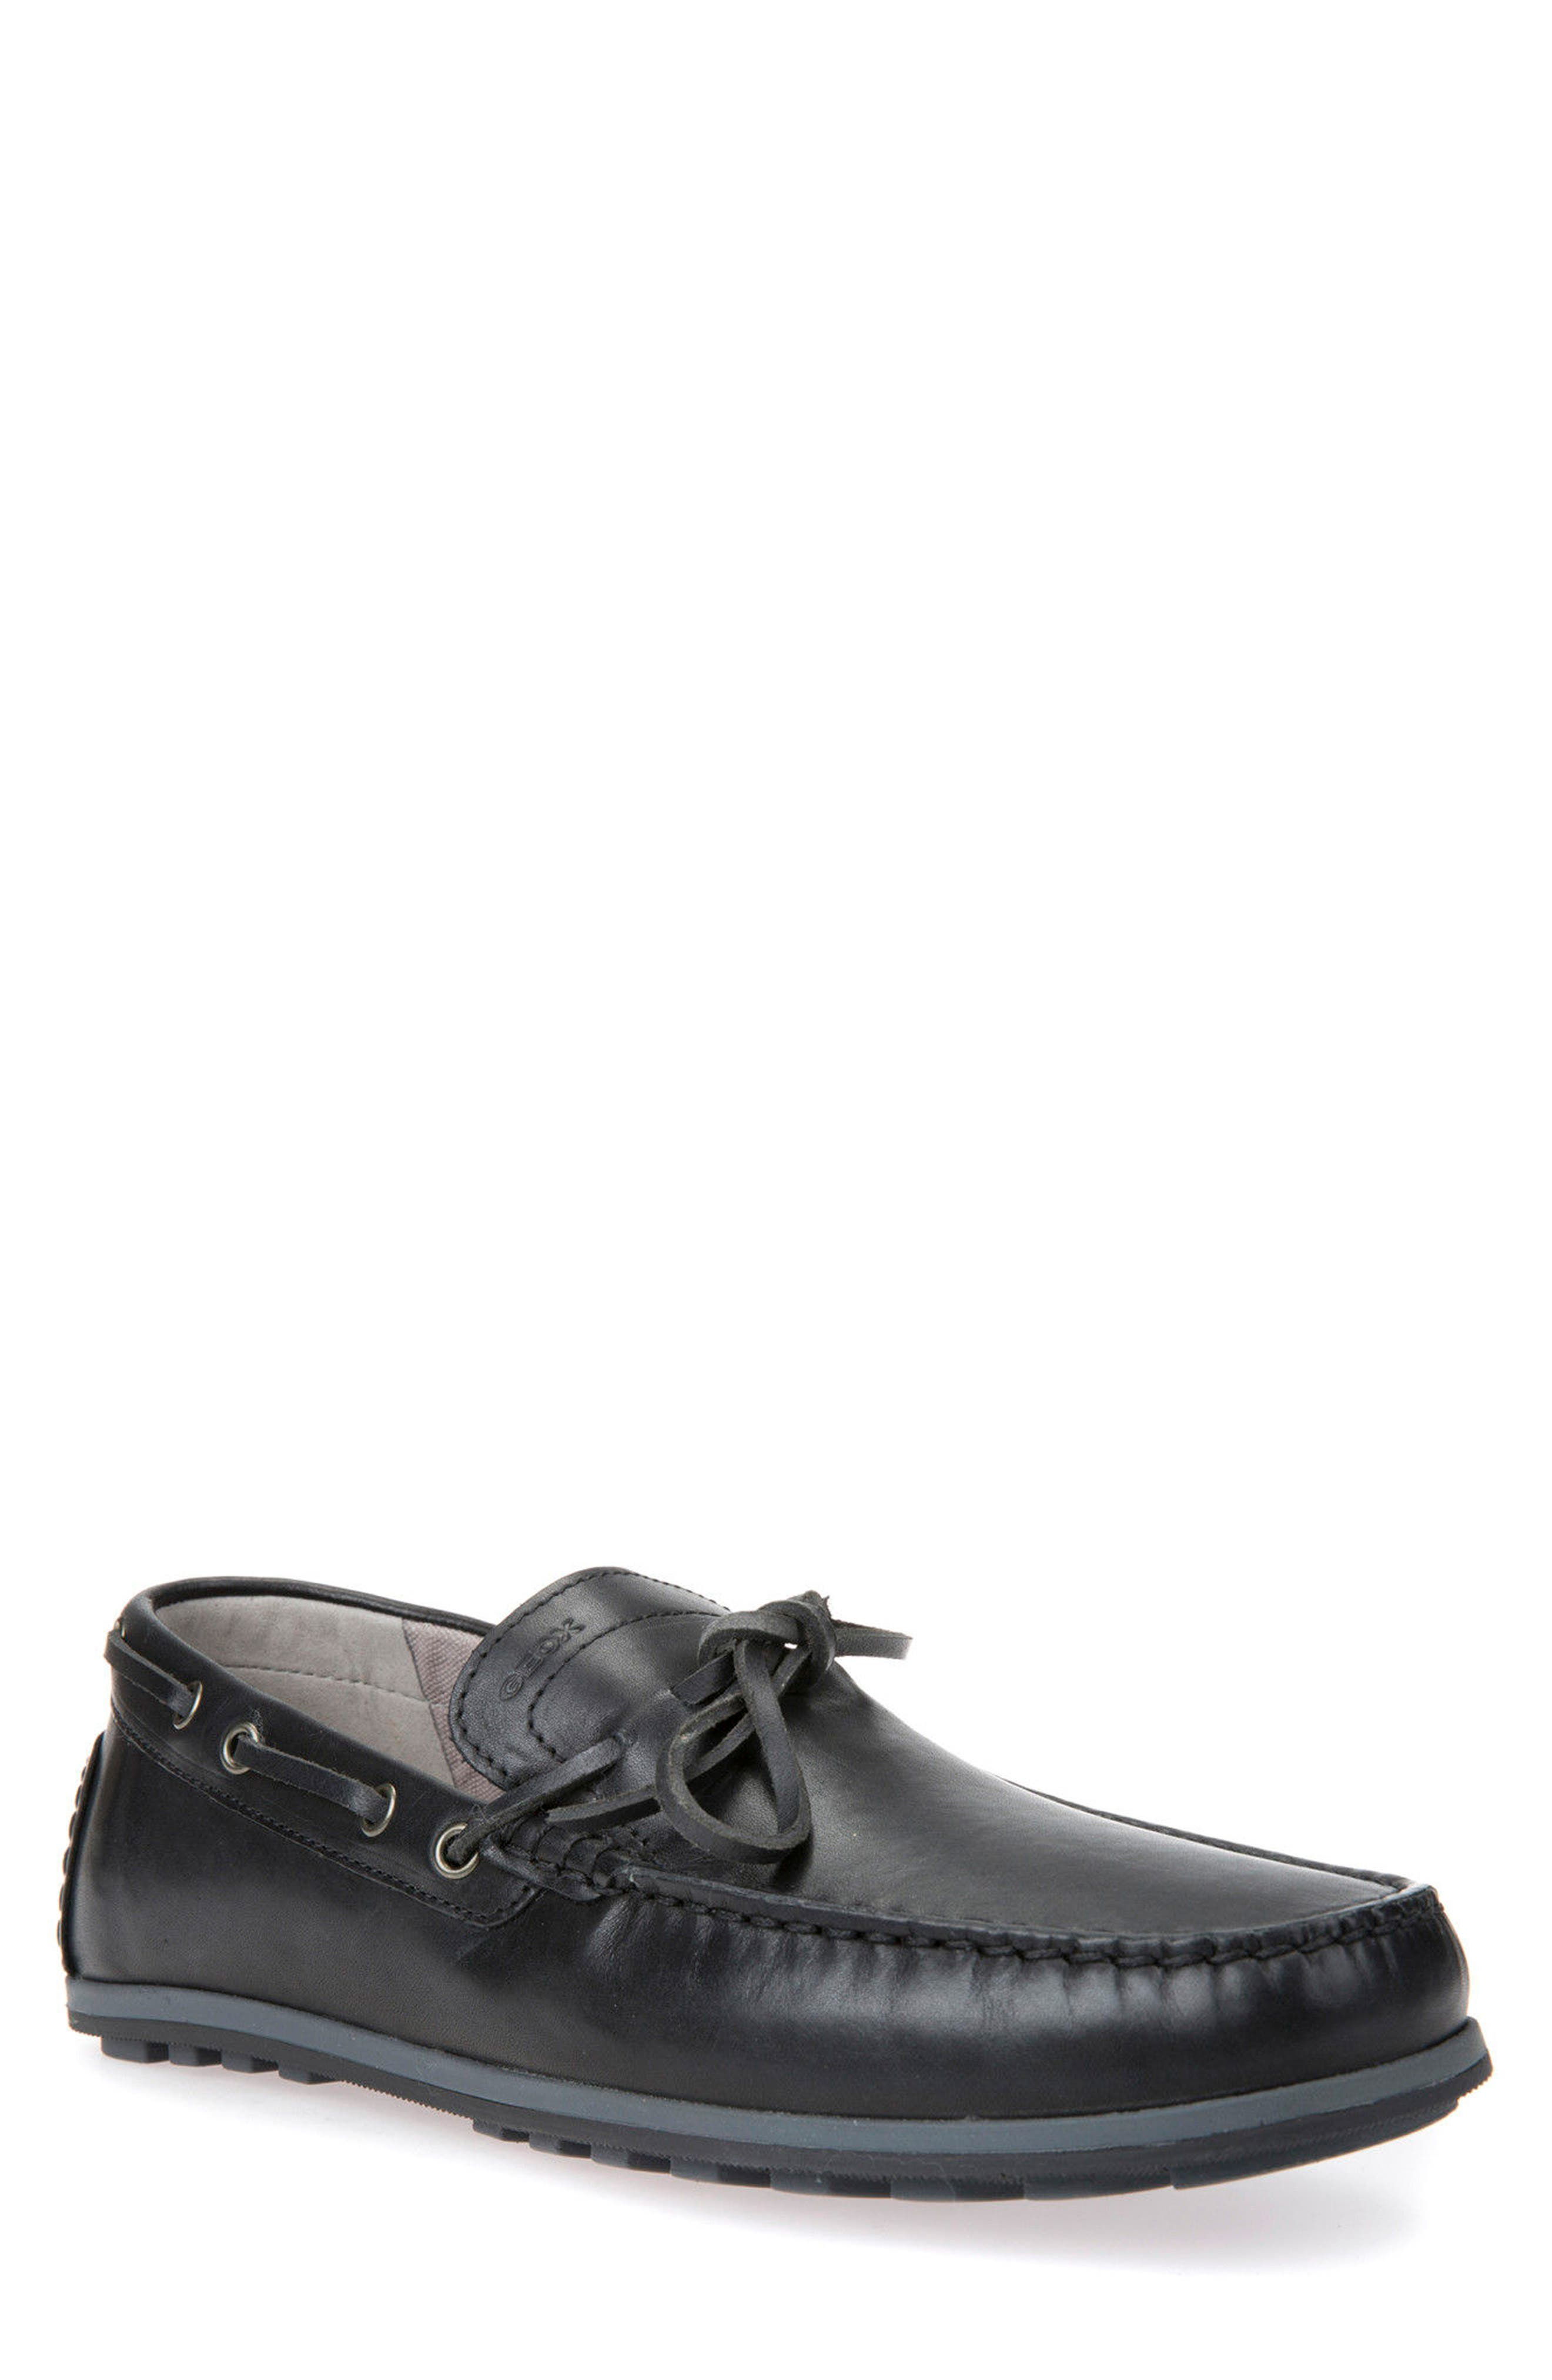 Alternate Image 1 Selected - Geox Mirvin 3 Boat Shoe (Men)